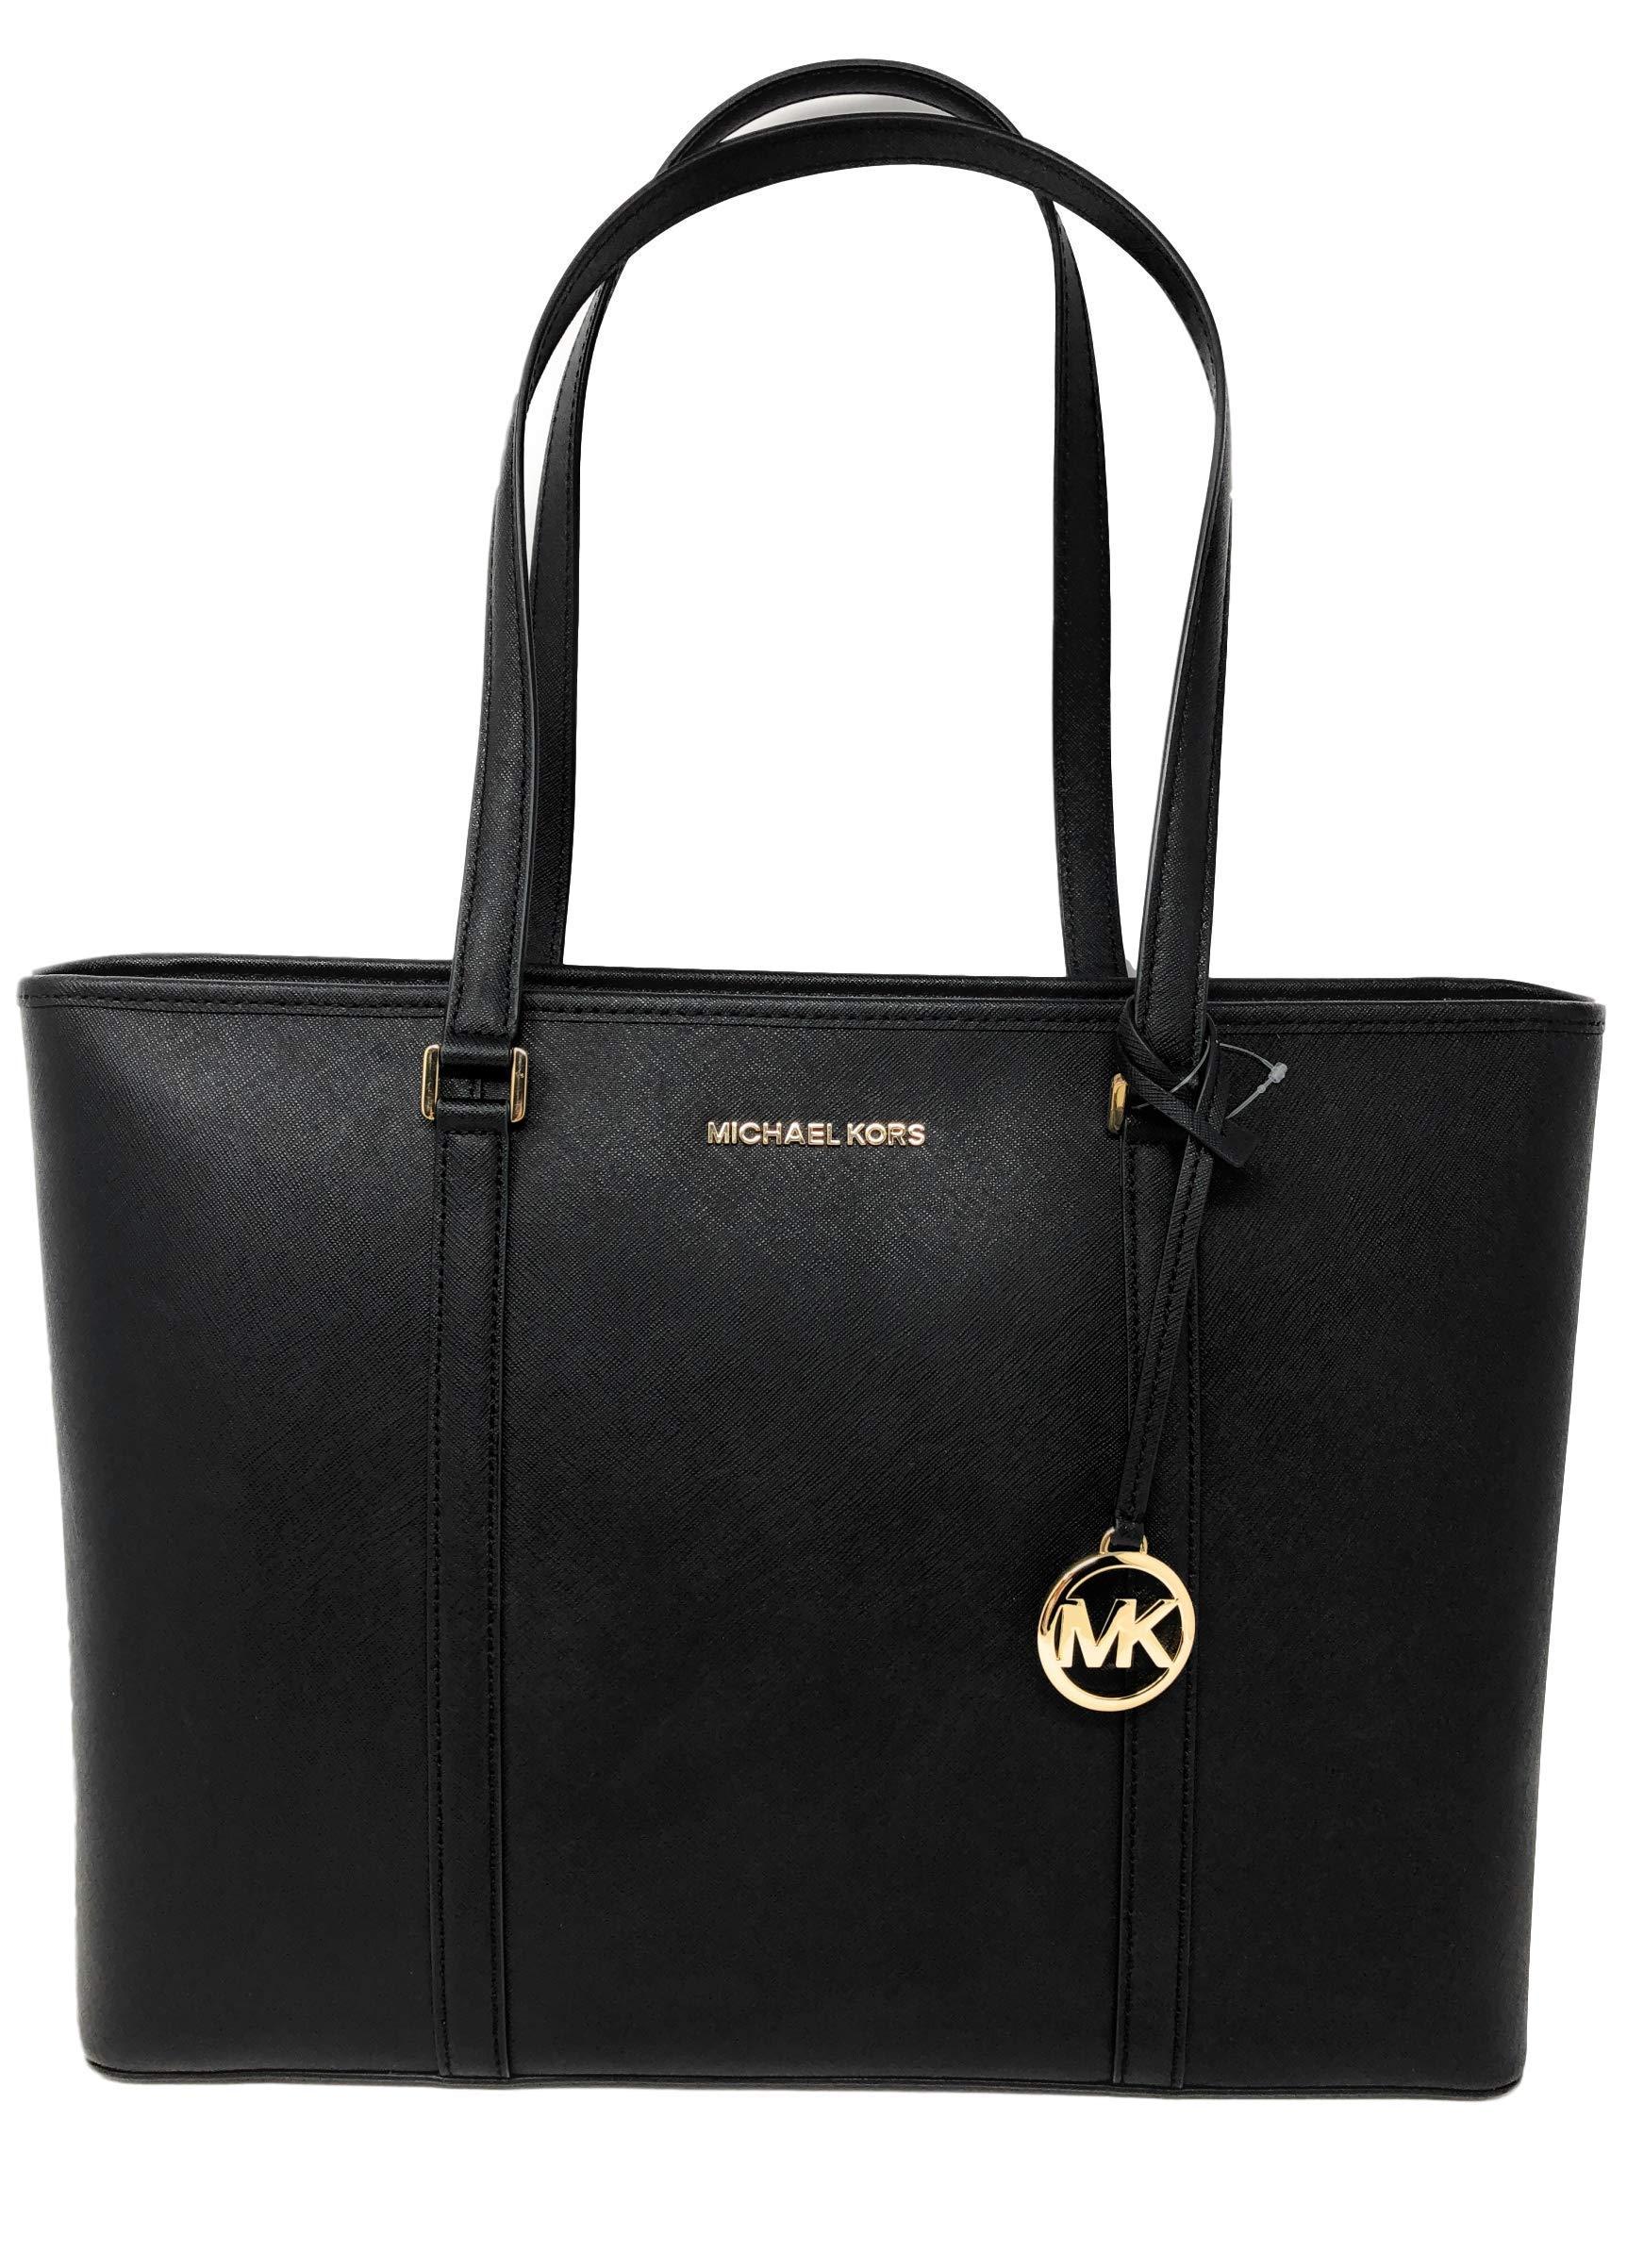 Michael Kors Large Sady Carryall  Bag by Michael Kors